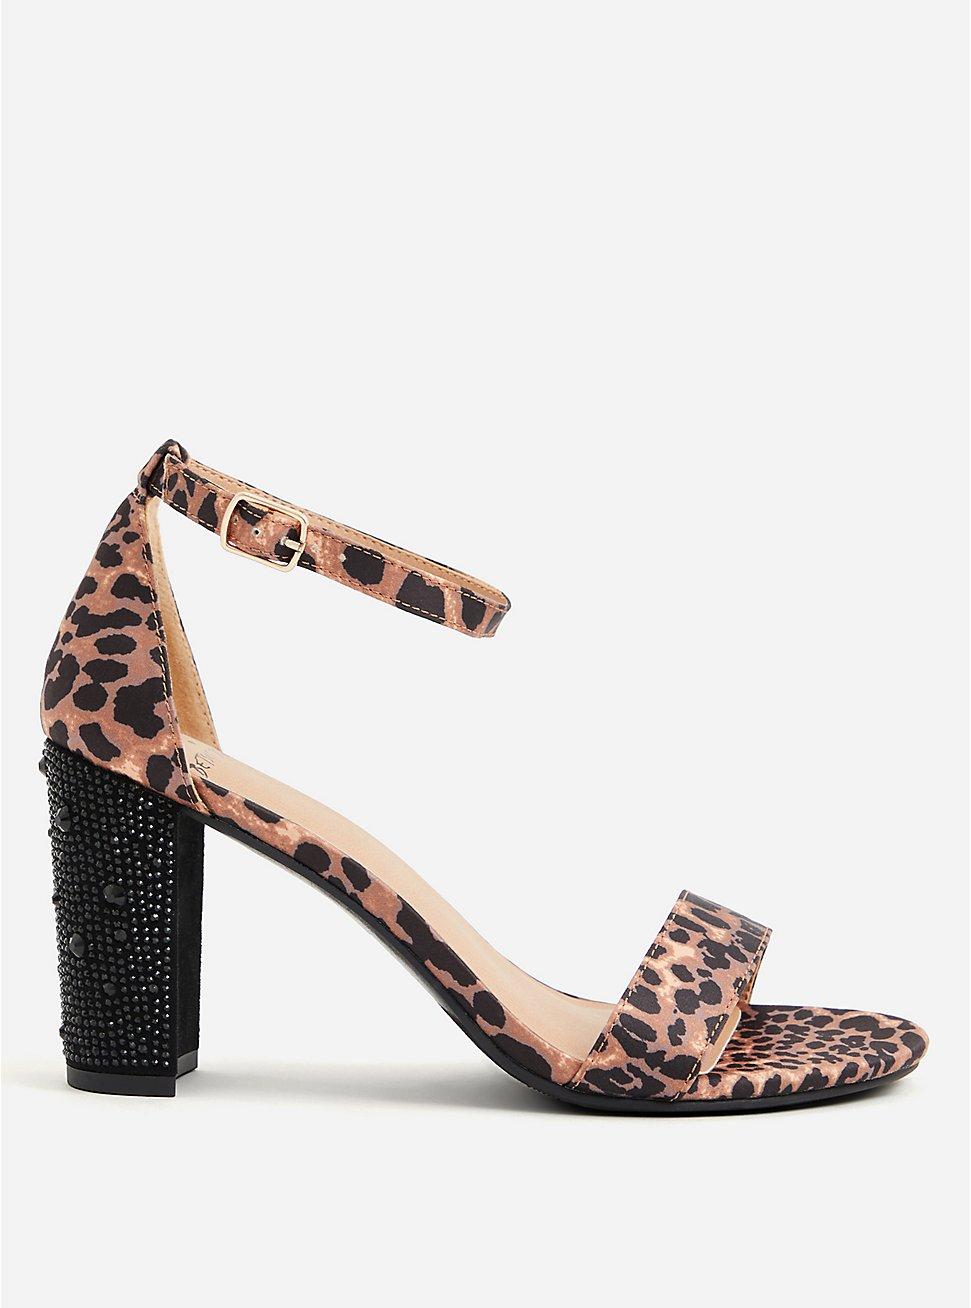 Betsey Johnson Leopard Glitter Tapered Heel (WW), ANIMAL, hi-res